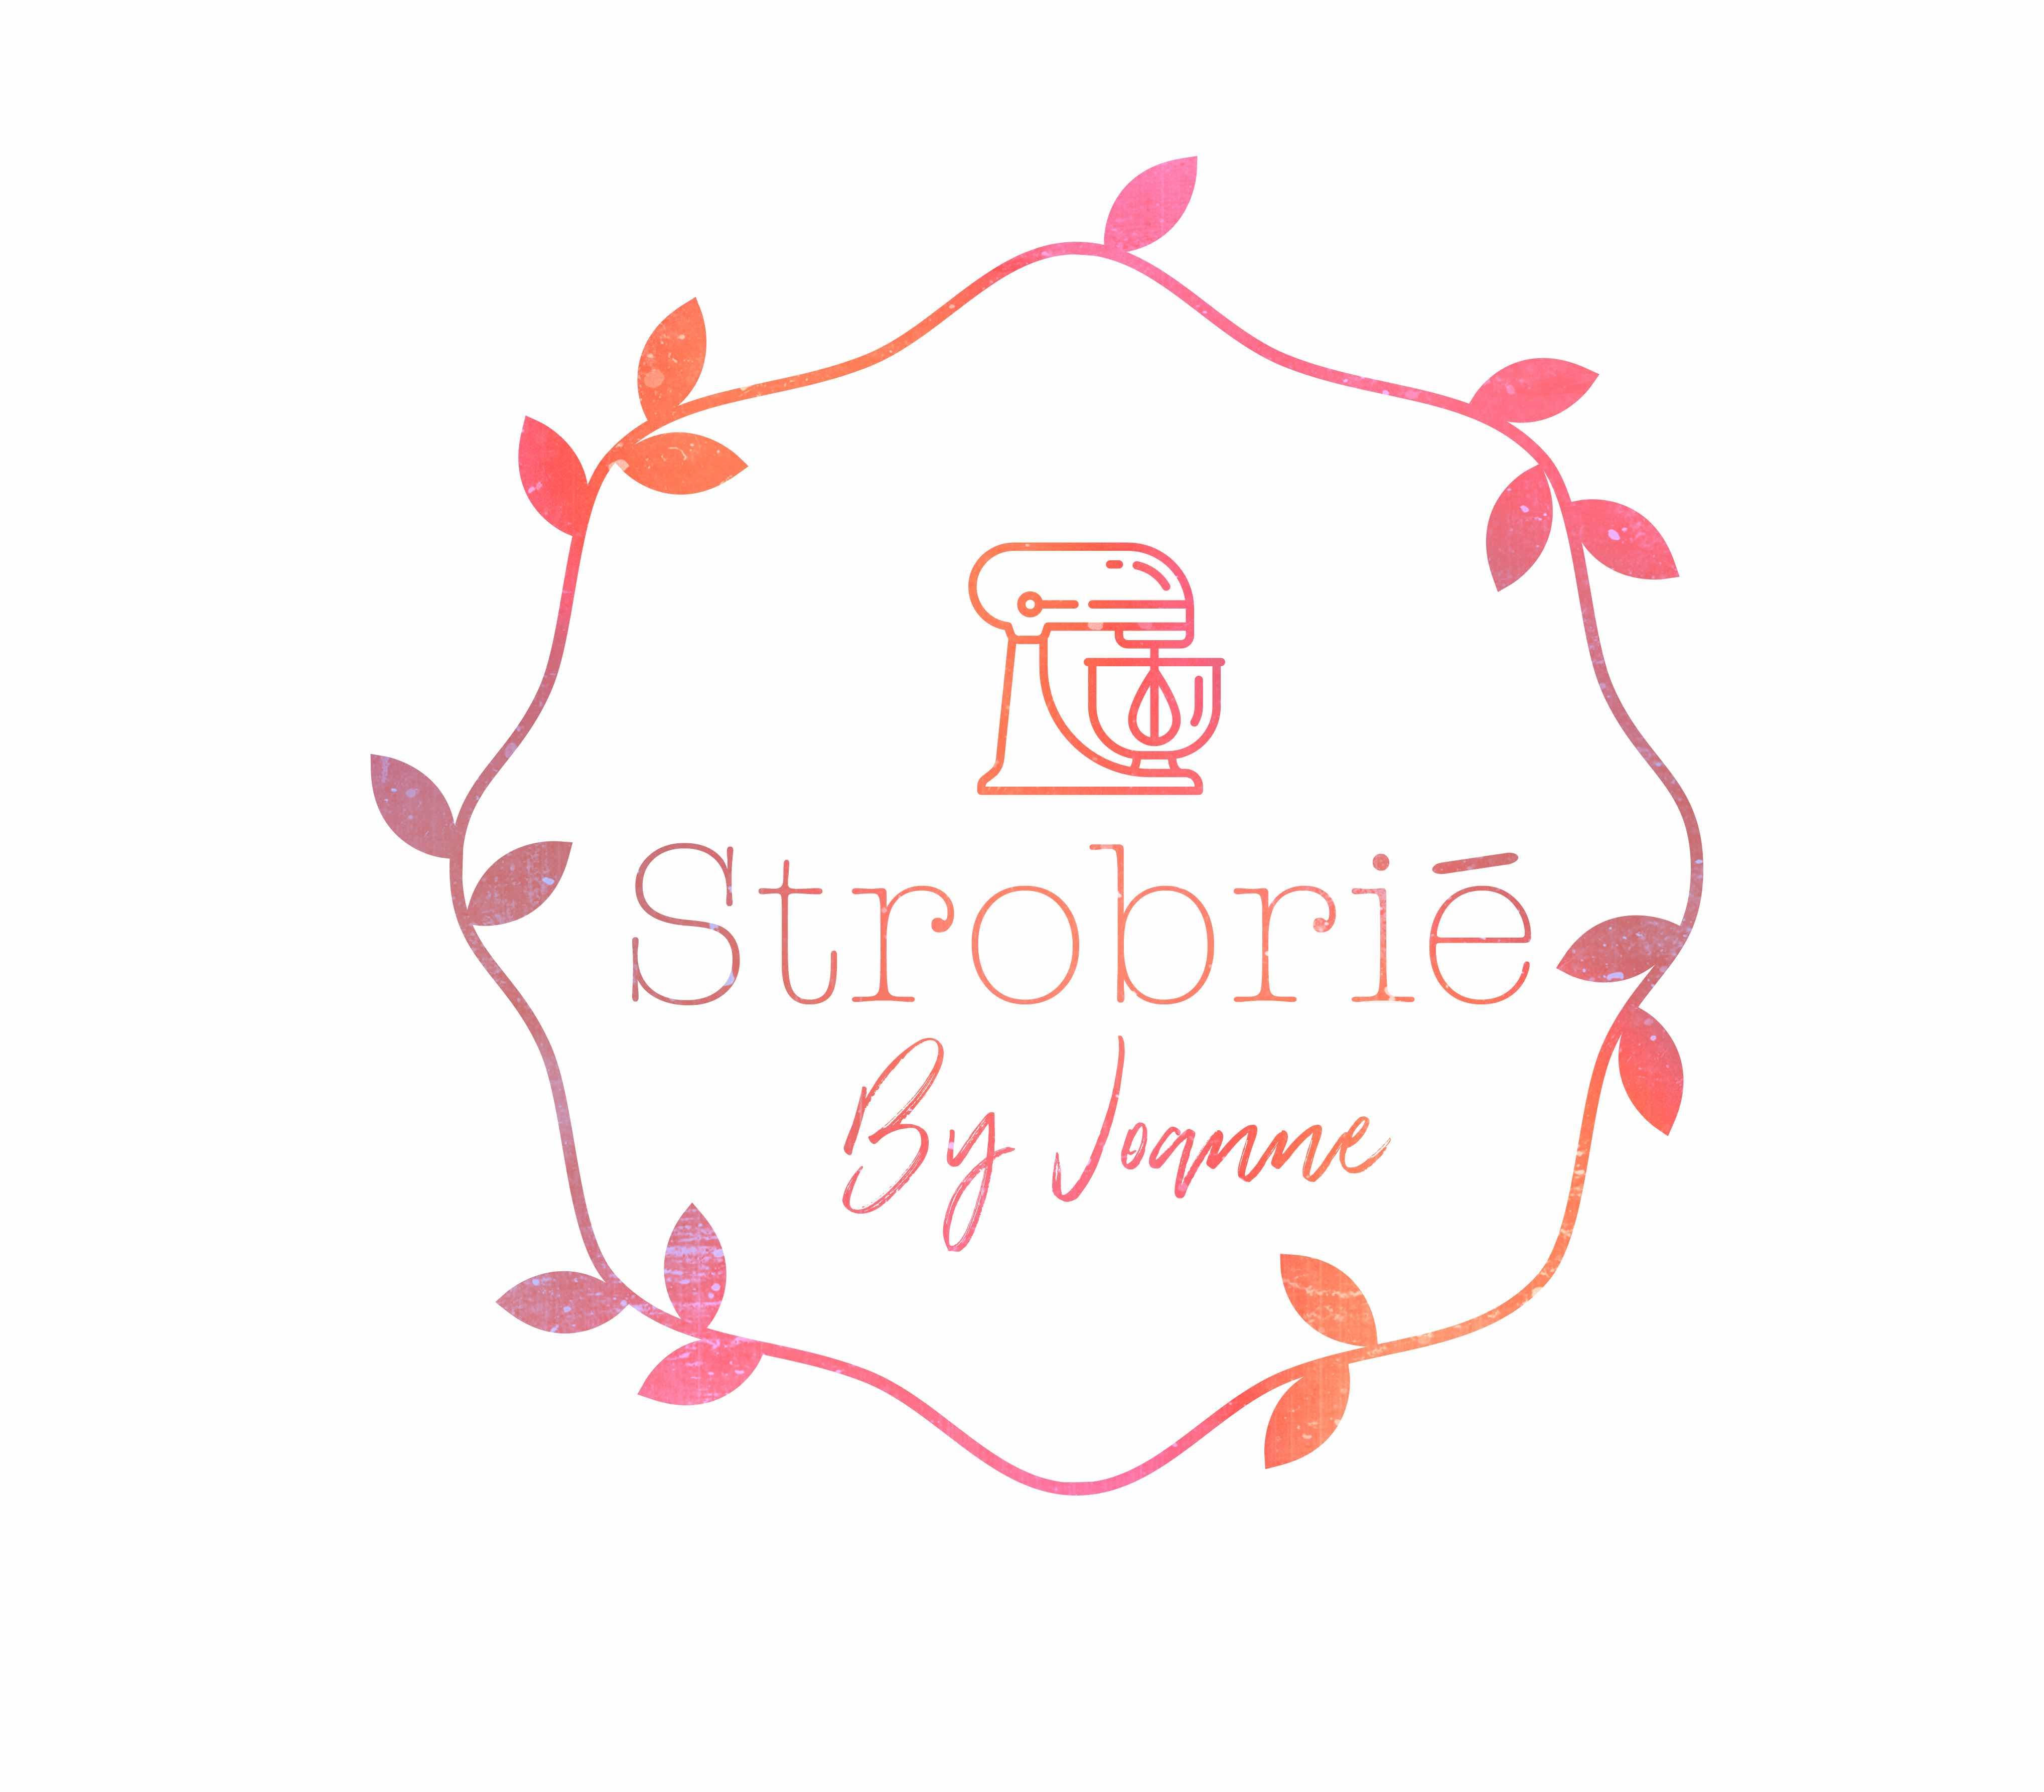 Strobrié By Joanne